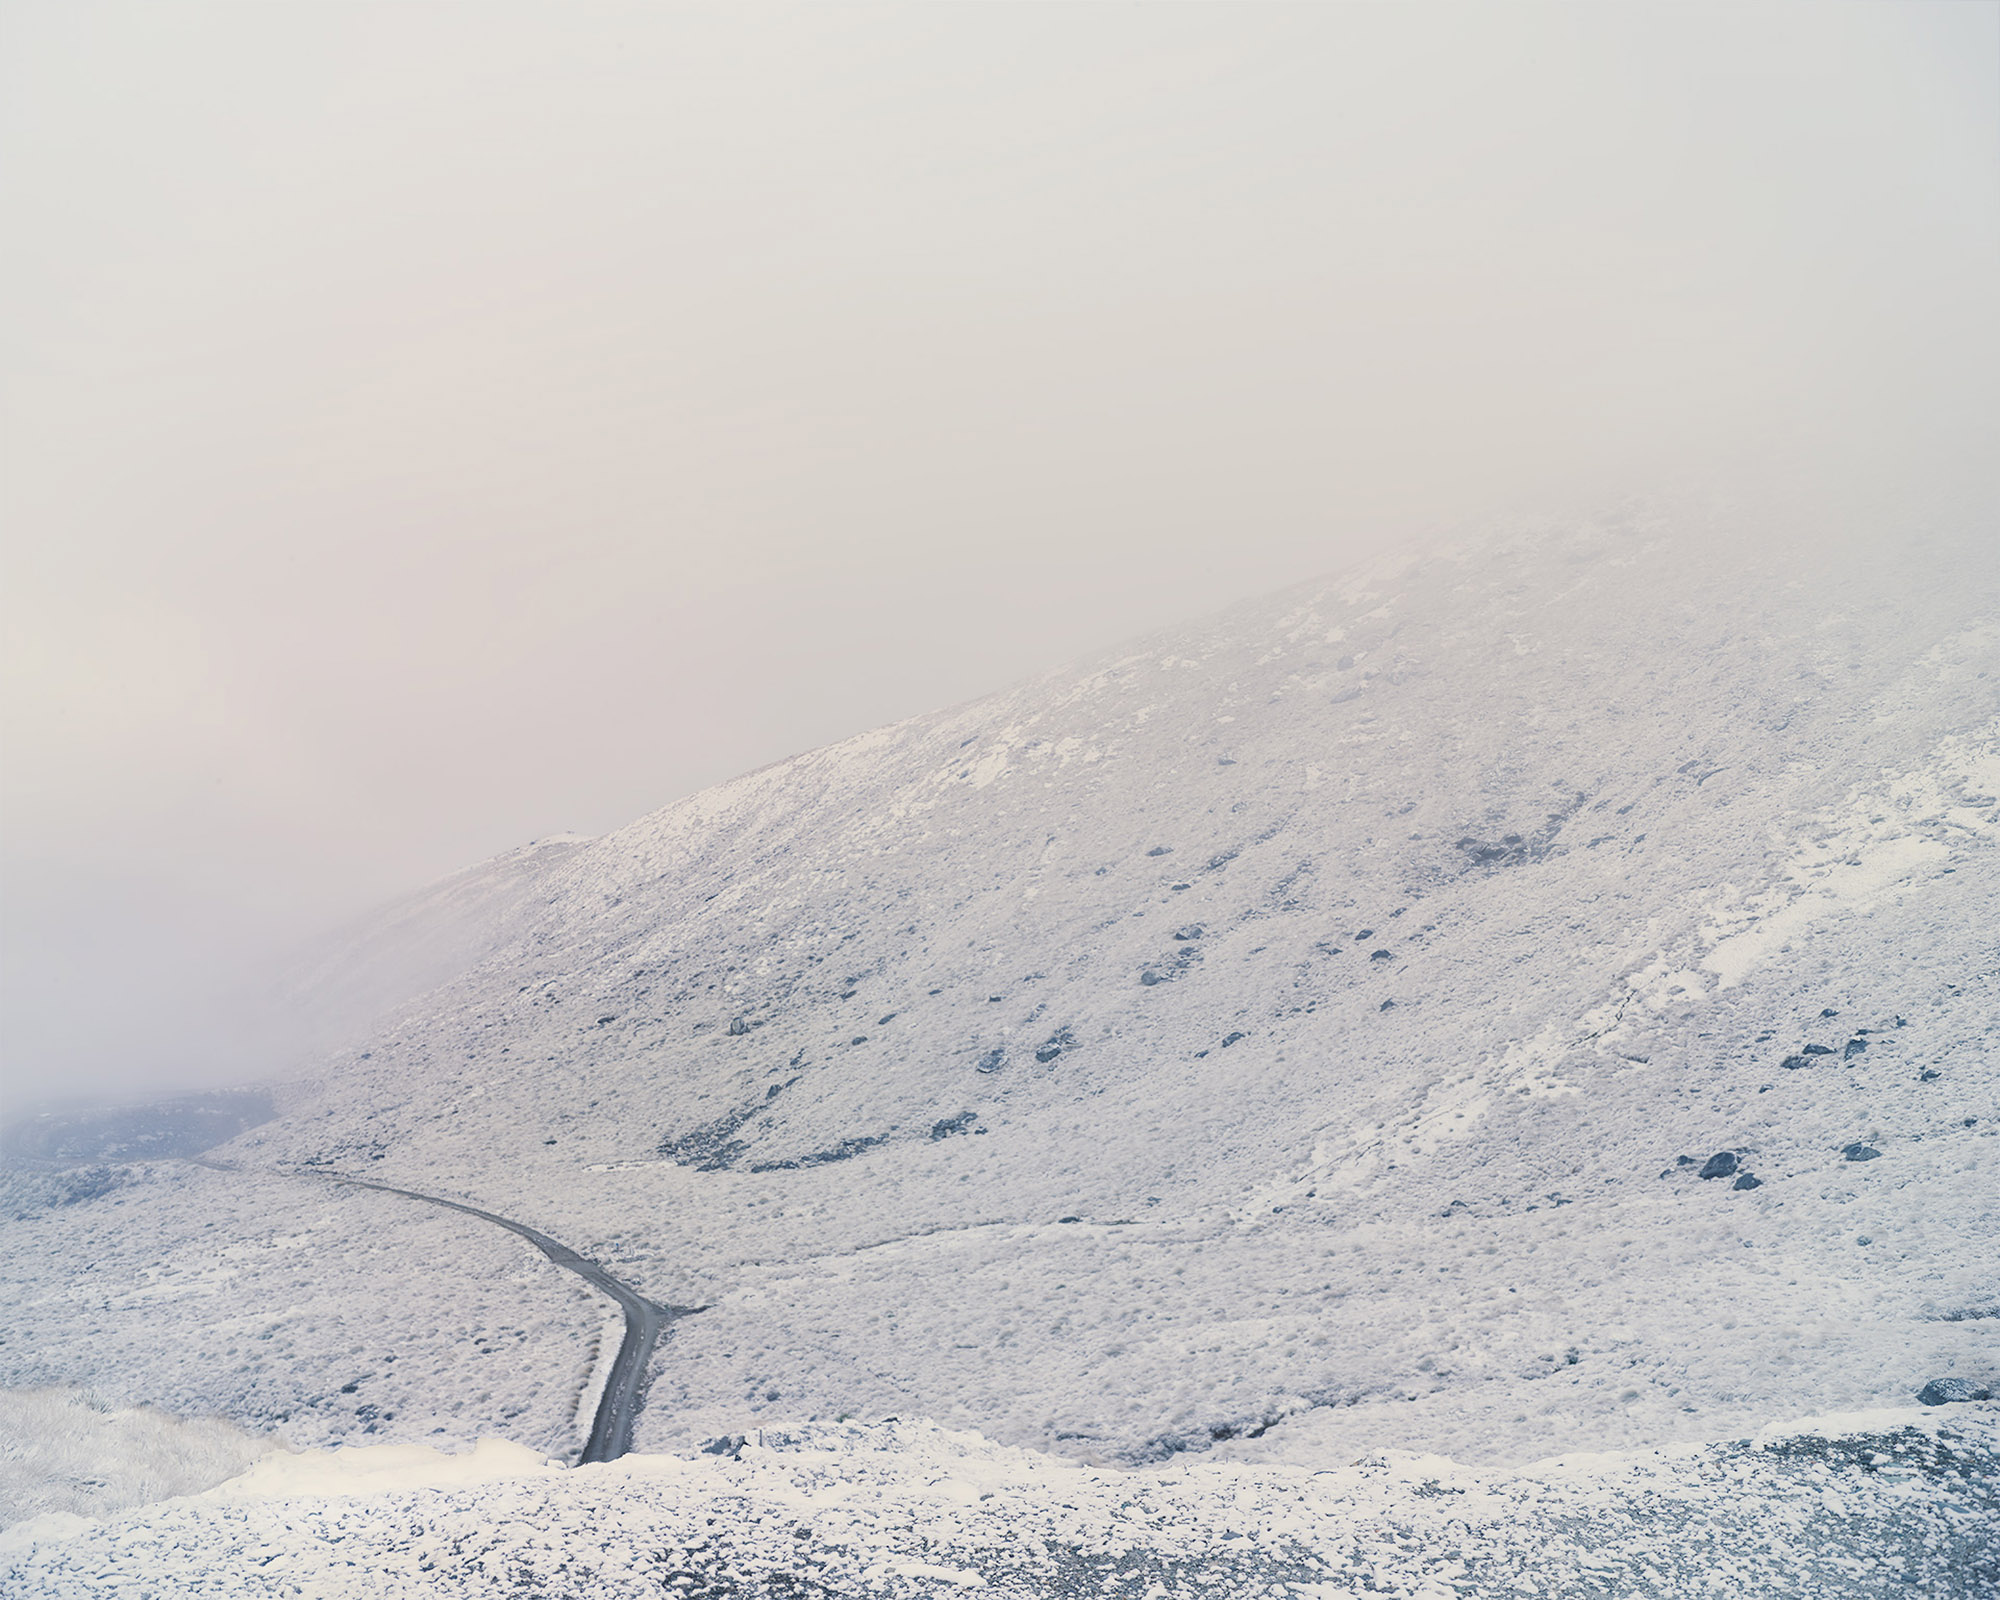 Artificial Snow Making Well, Otago, New Zealand,2015. © Alan McFetridge